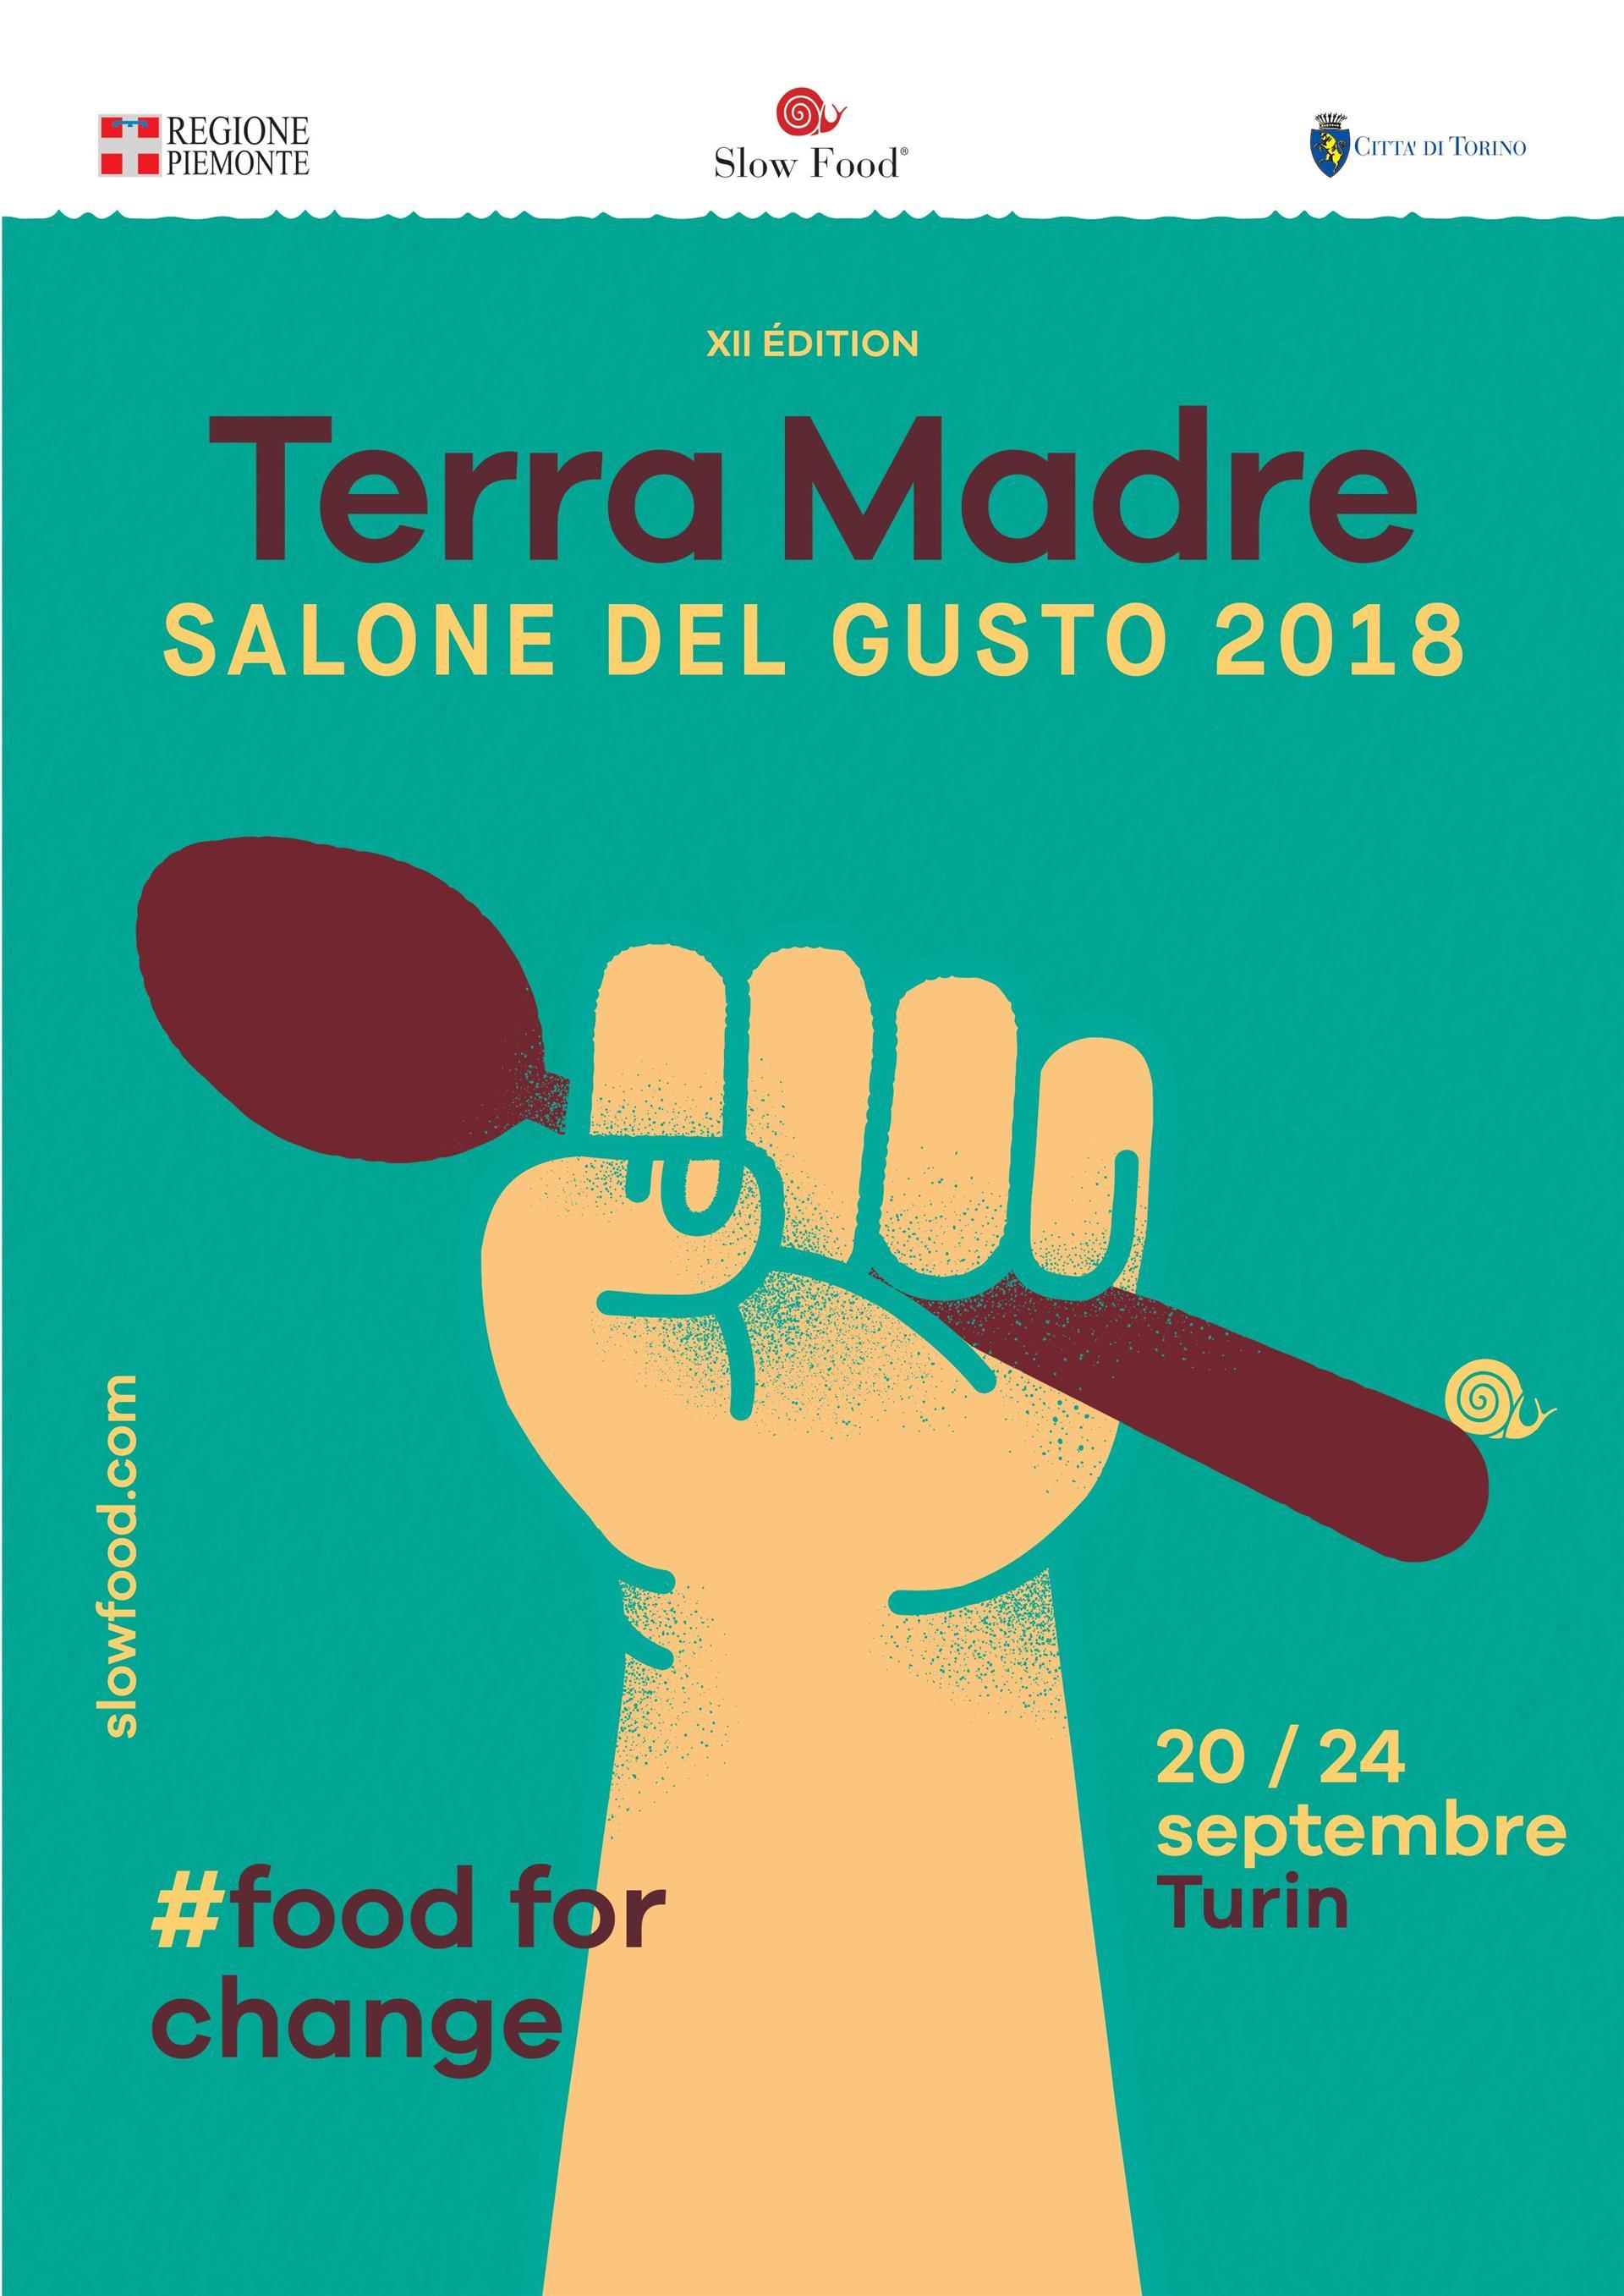 Terra Madre Salone del Gusto présente l'innovation majeure de l'édition 2018